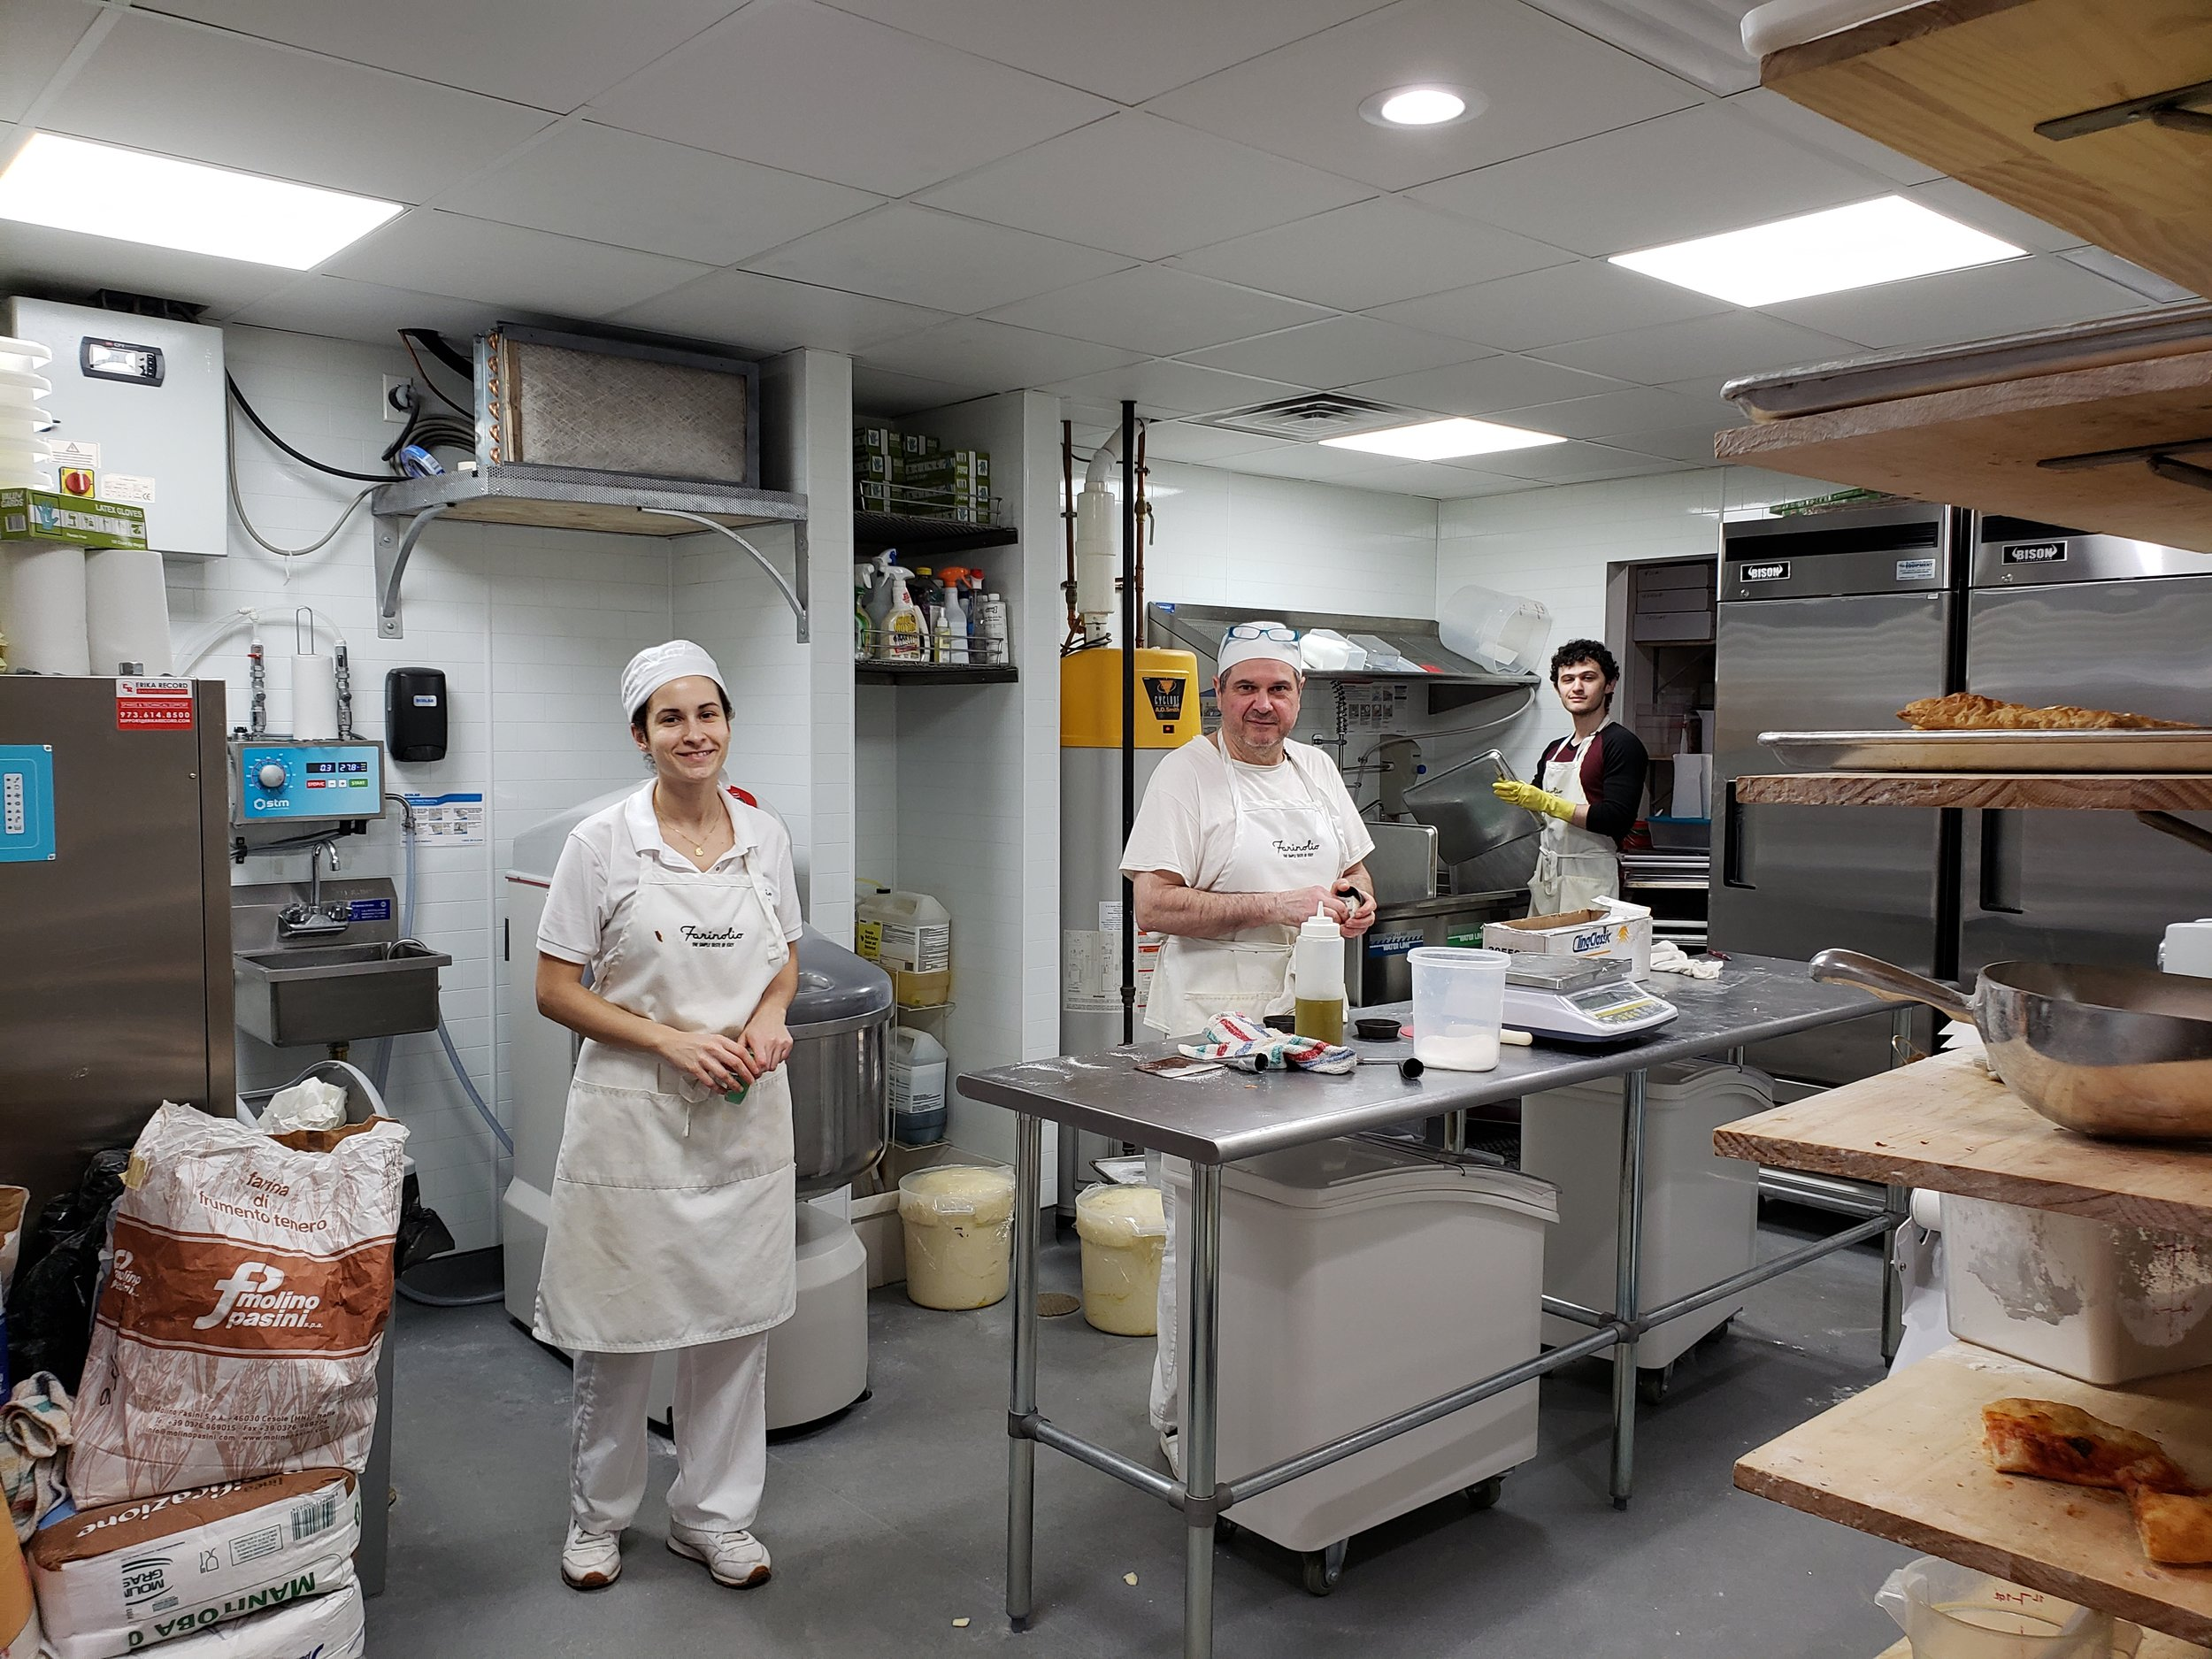 Head Baker Tonino Salvatori and his staff